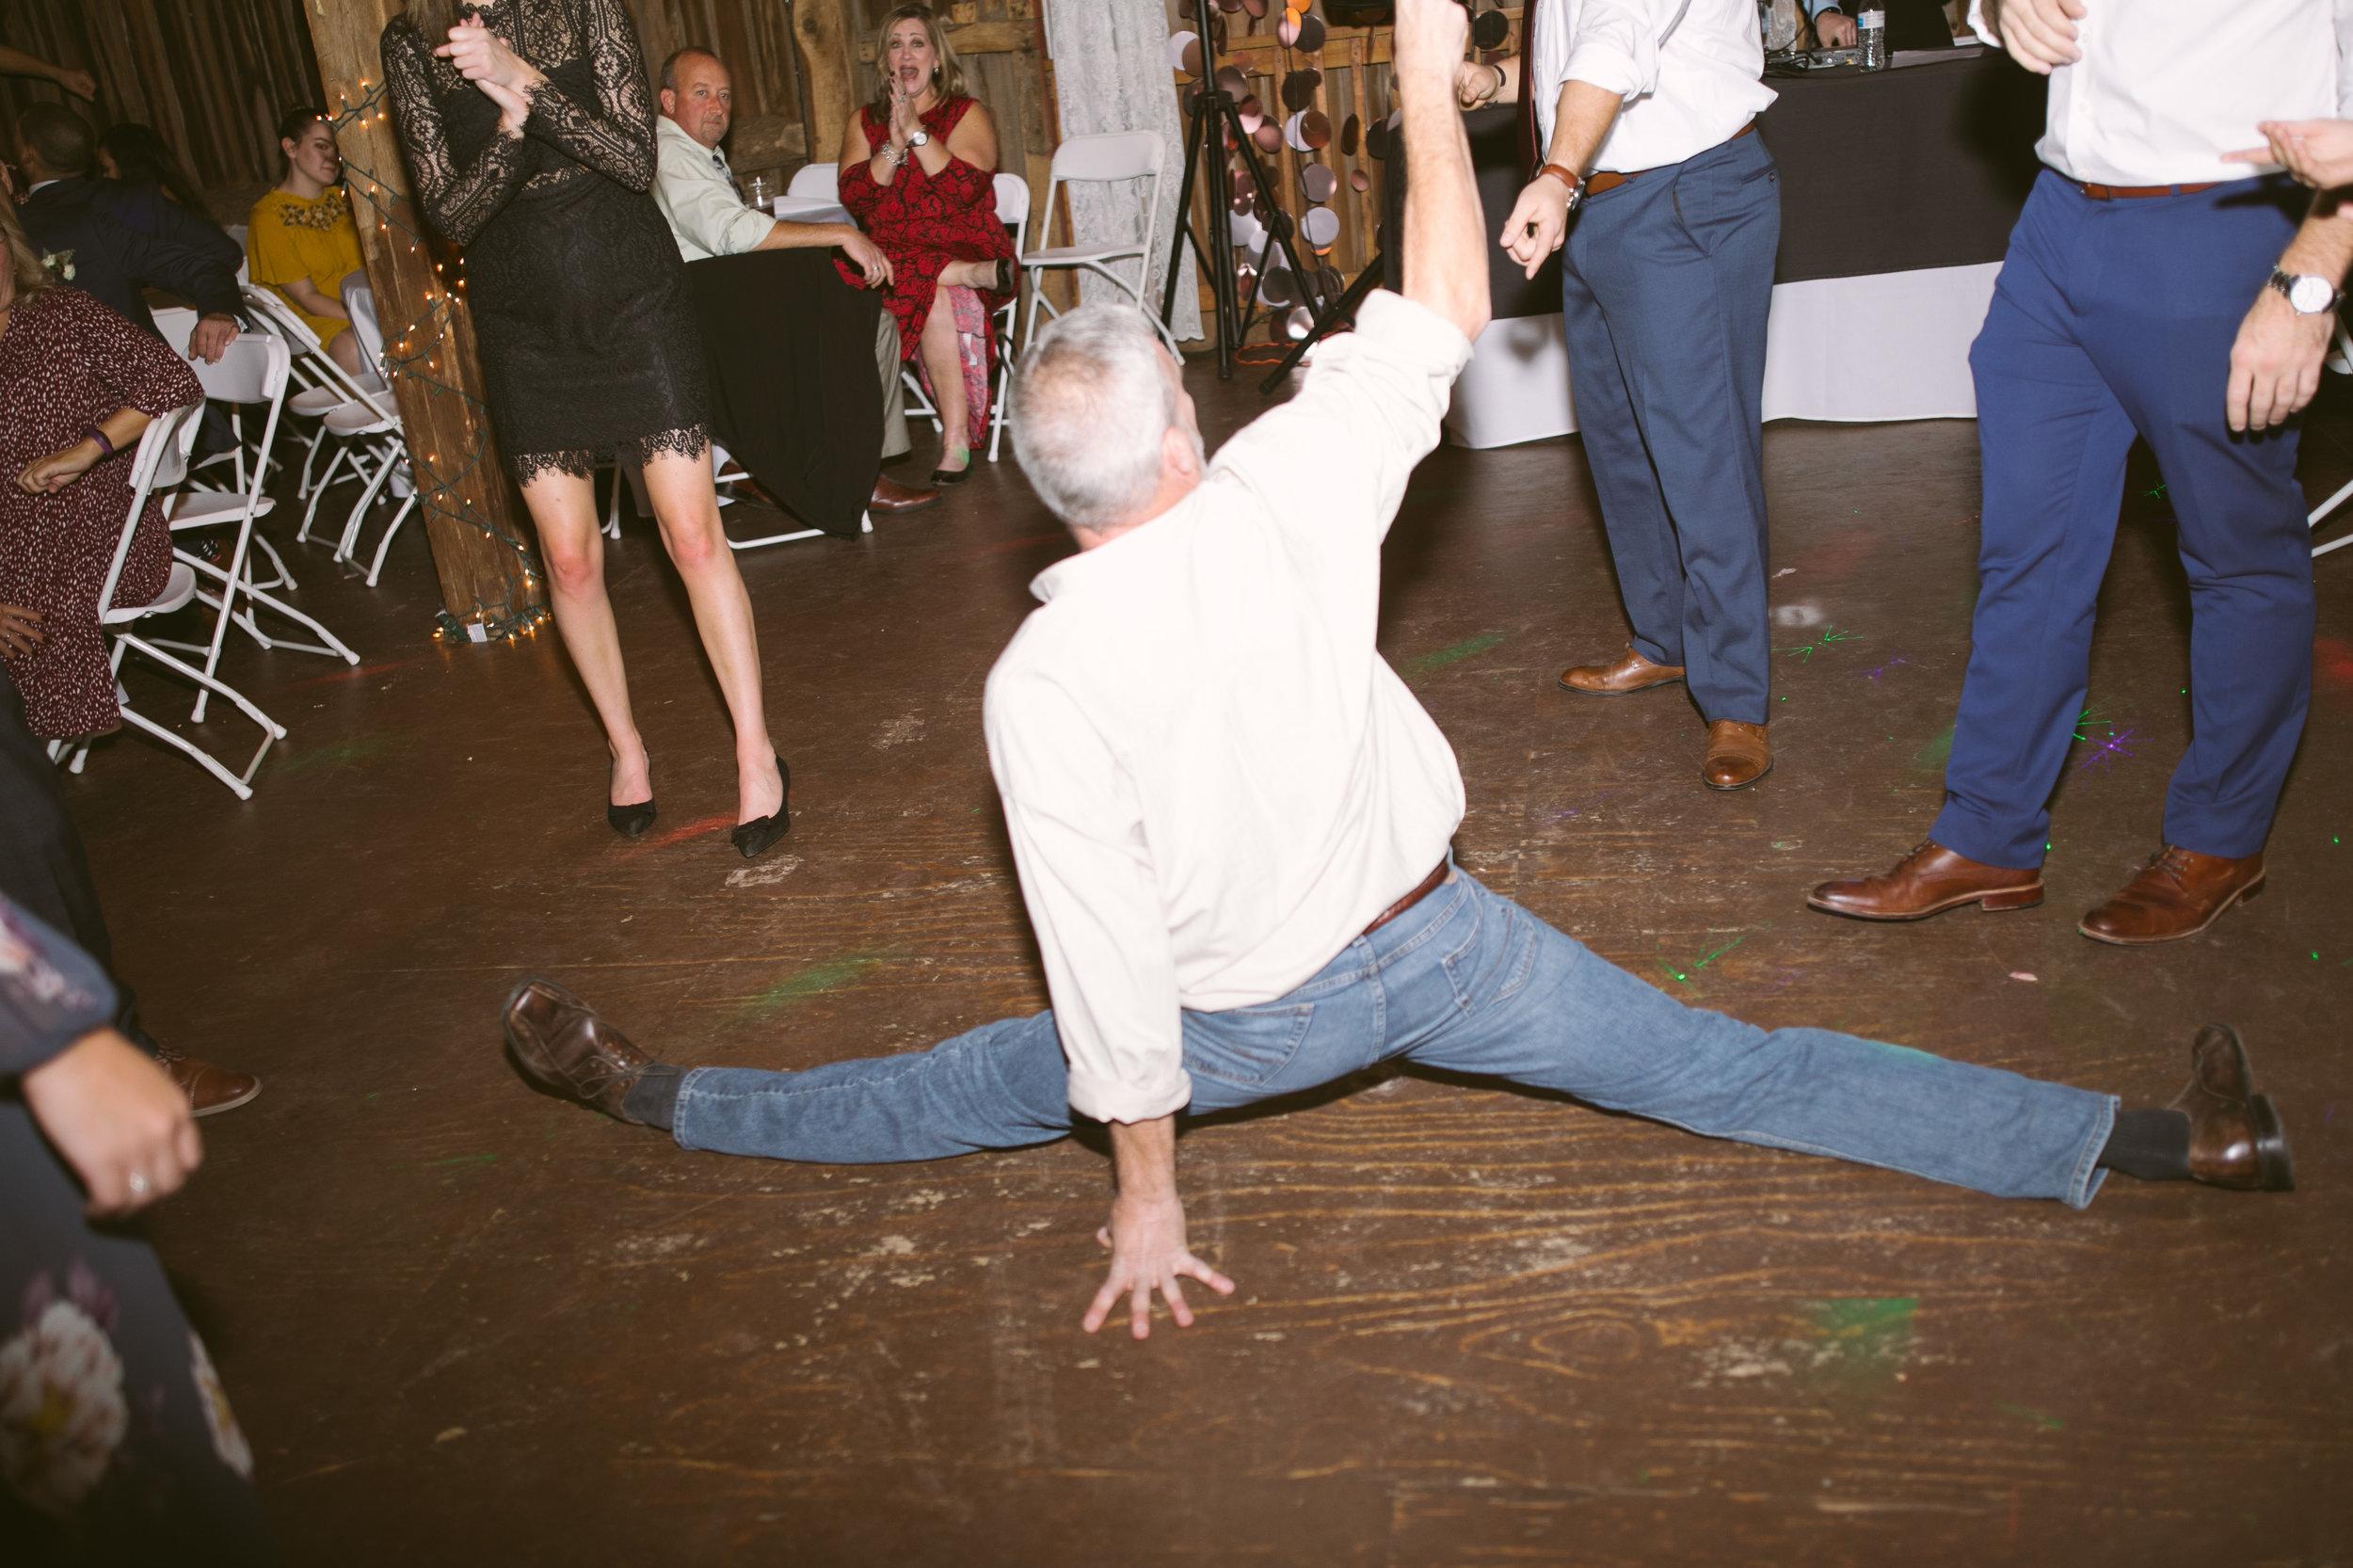 wildwoodfamilyfarms-wildwood farms-grand rapids-grand rapids wedding -grand rapids wedding photographer-wedding-wildwood farms wedding-michigan wedding-west michigan photographer-jessica darling-j darling photo-becca and josh wedding 116.jpg